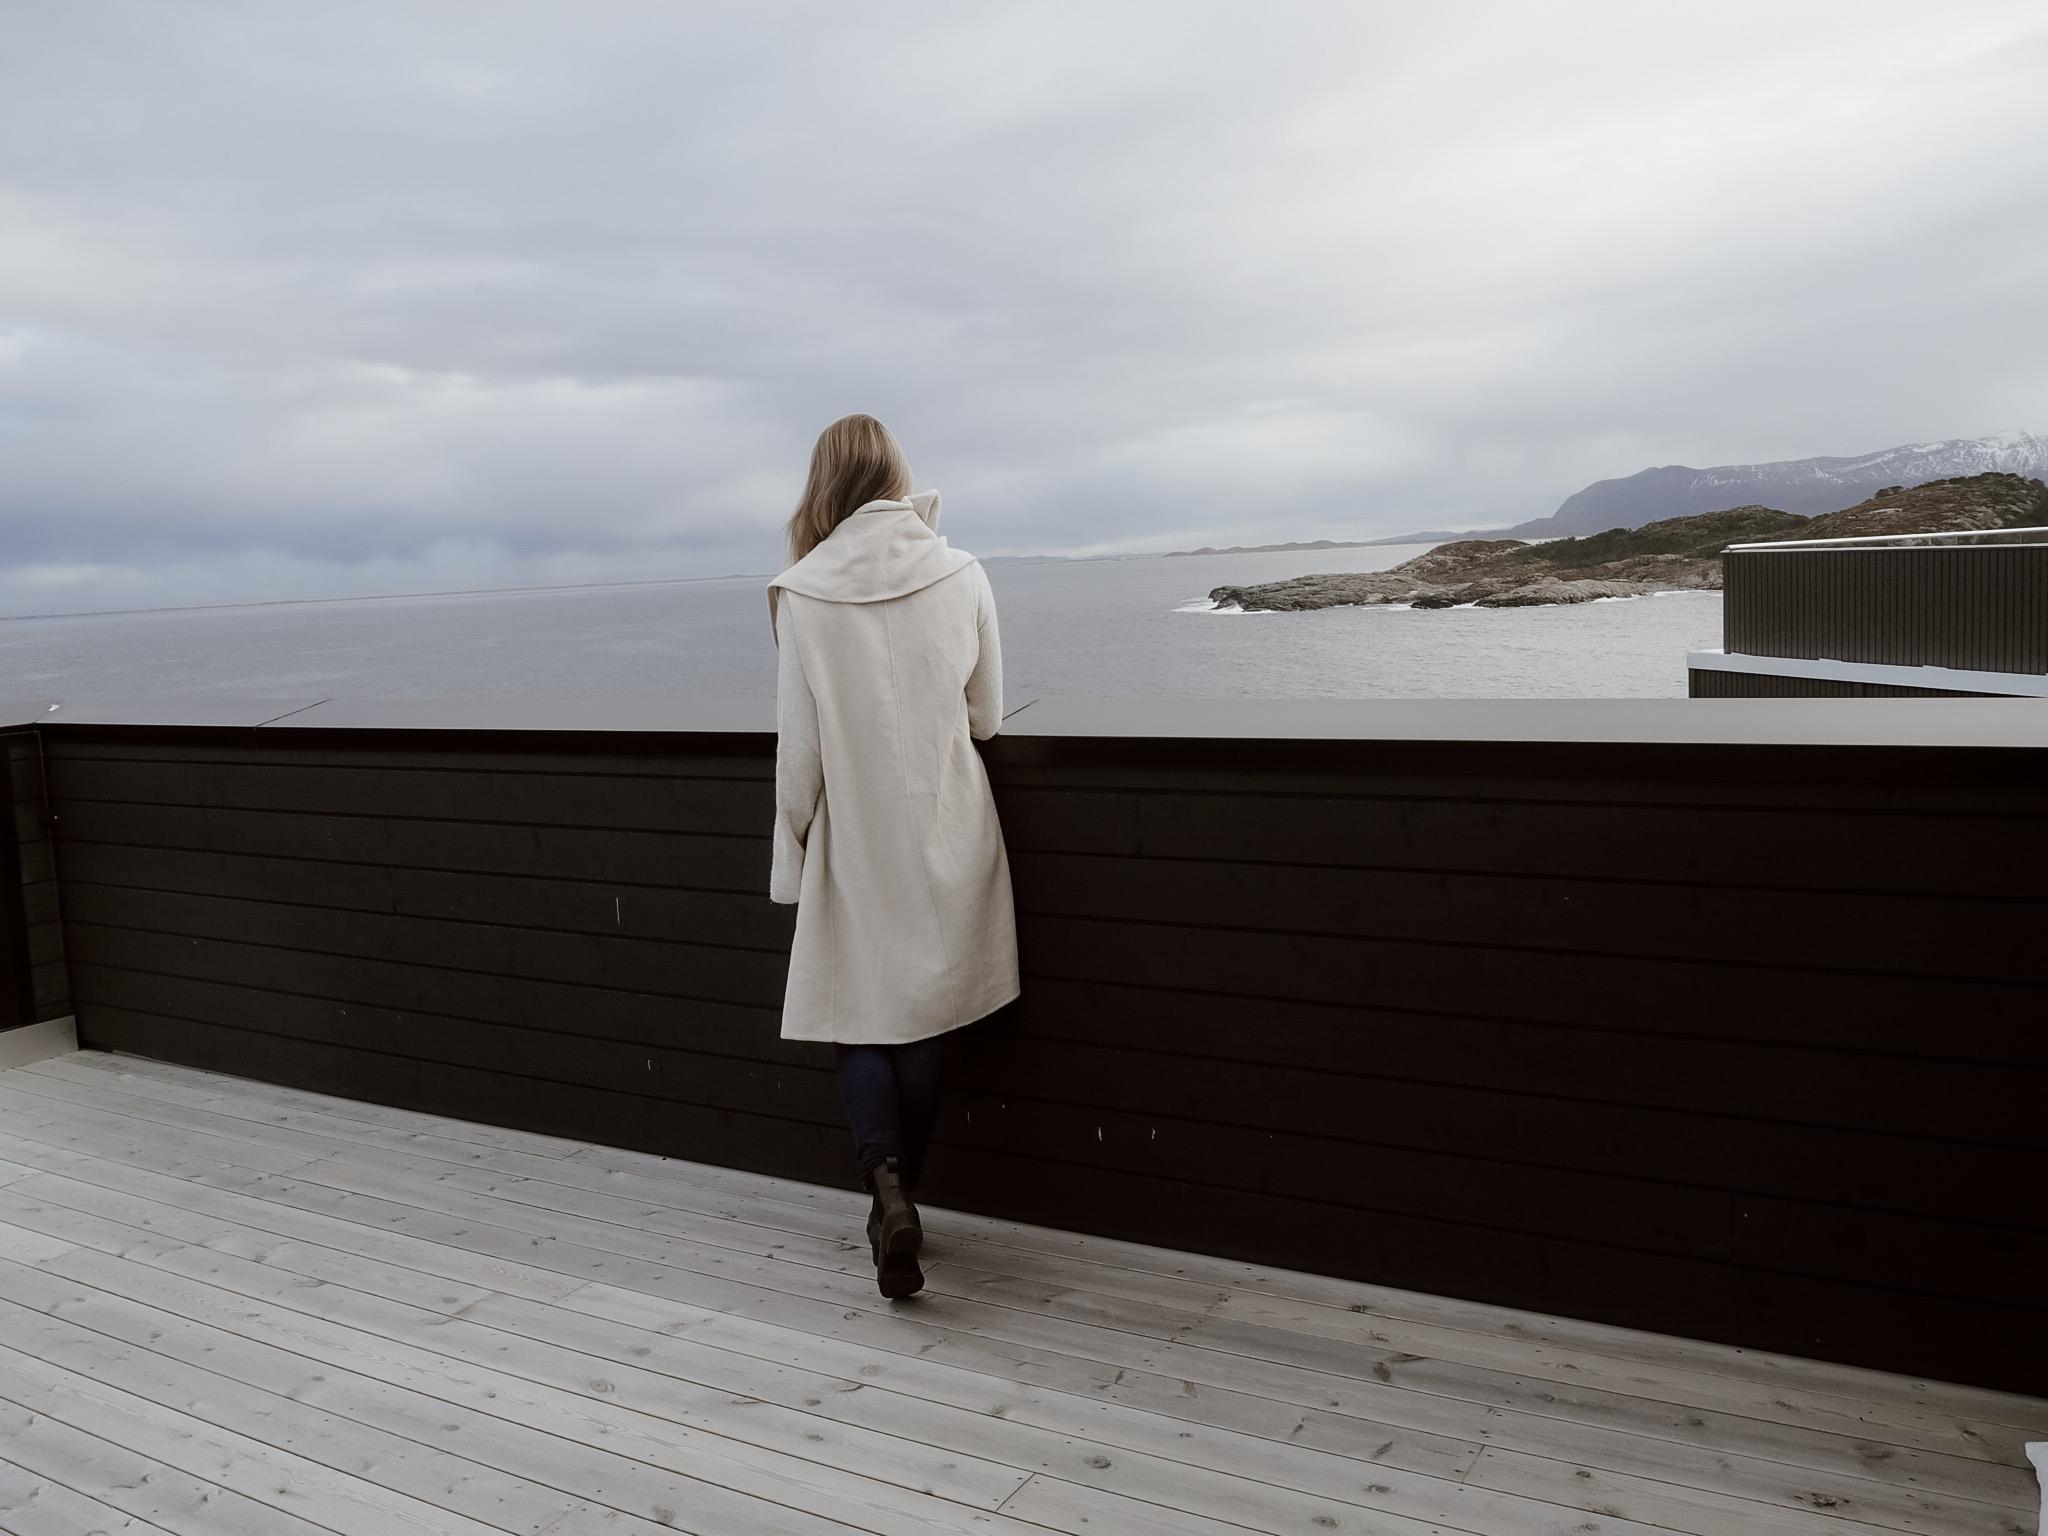 antrekksbilder på terassen, dalabukta Klar for Opera i Kristiansund, Rigoletto